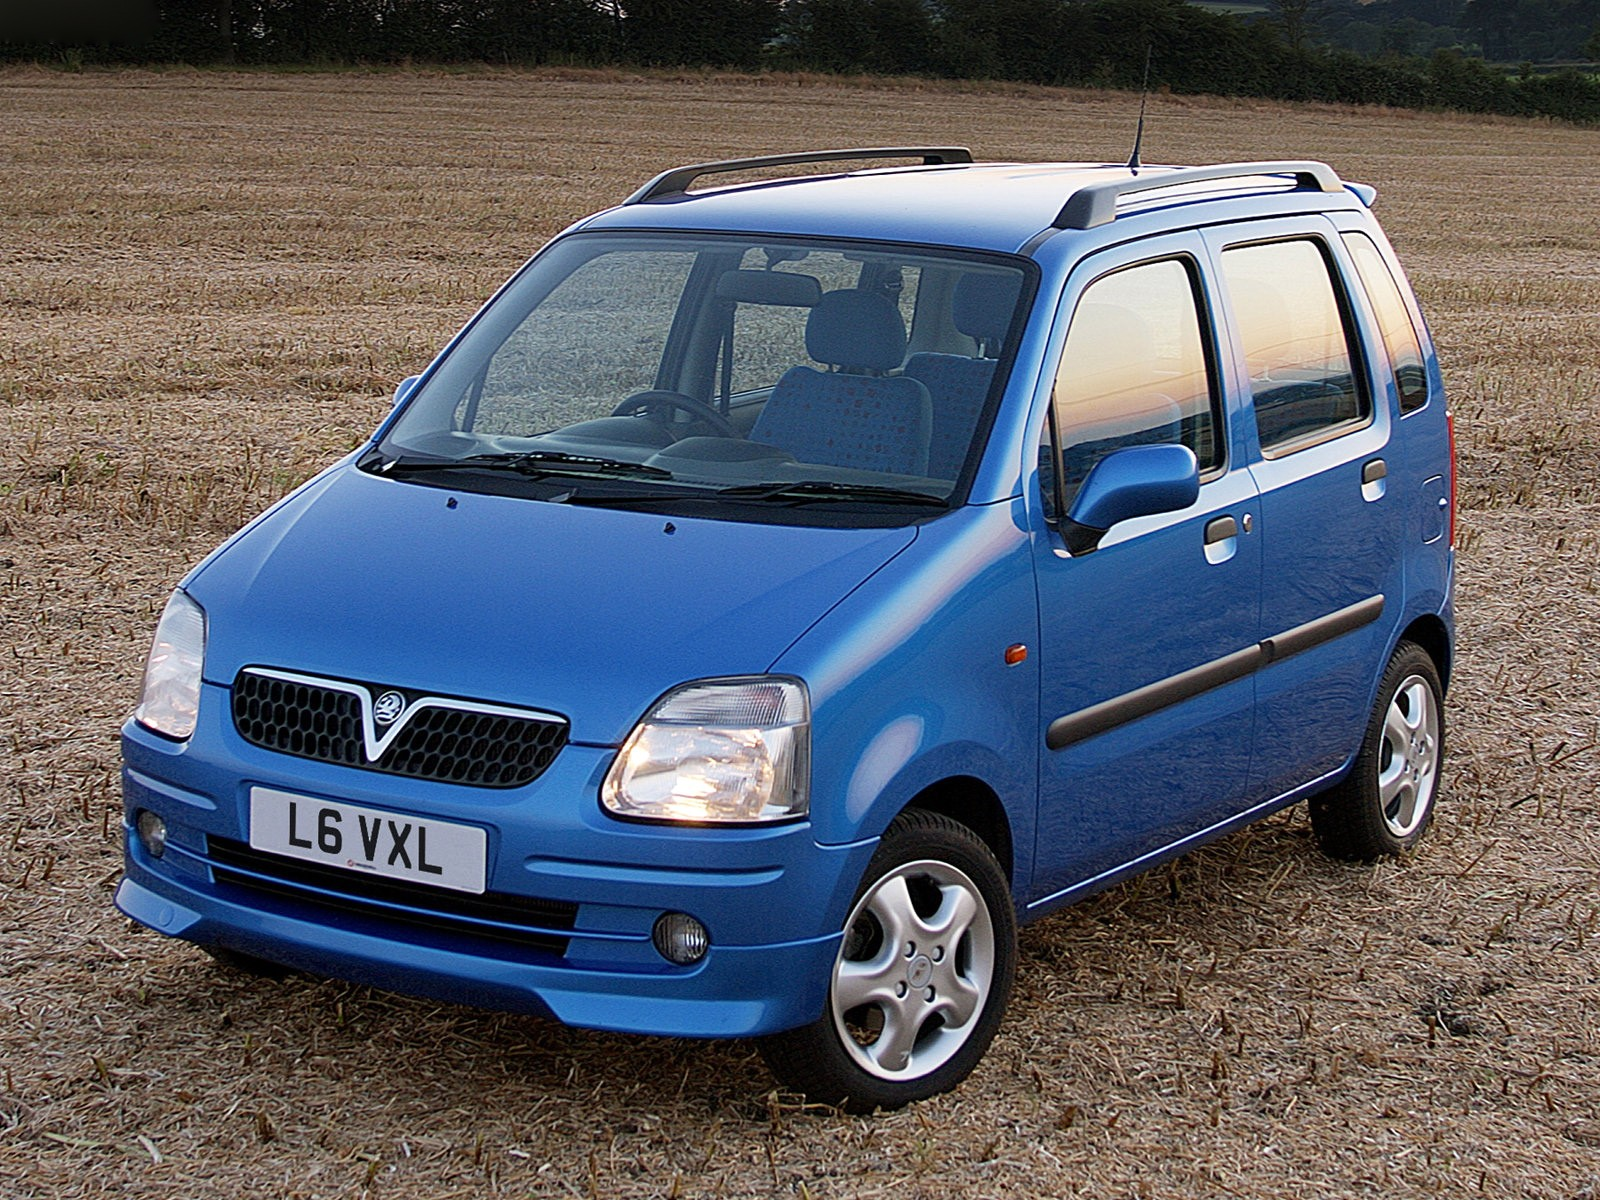 Vauxhall Agila 2000 2001 2002 2003 2004 2005 2006